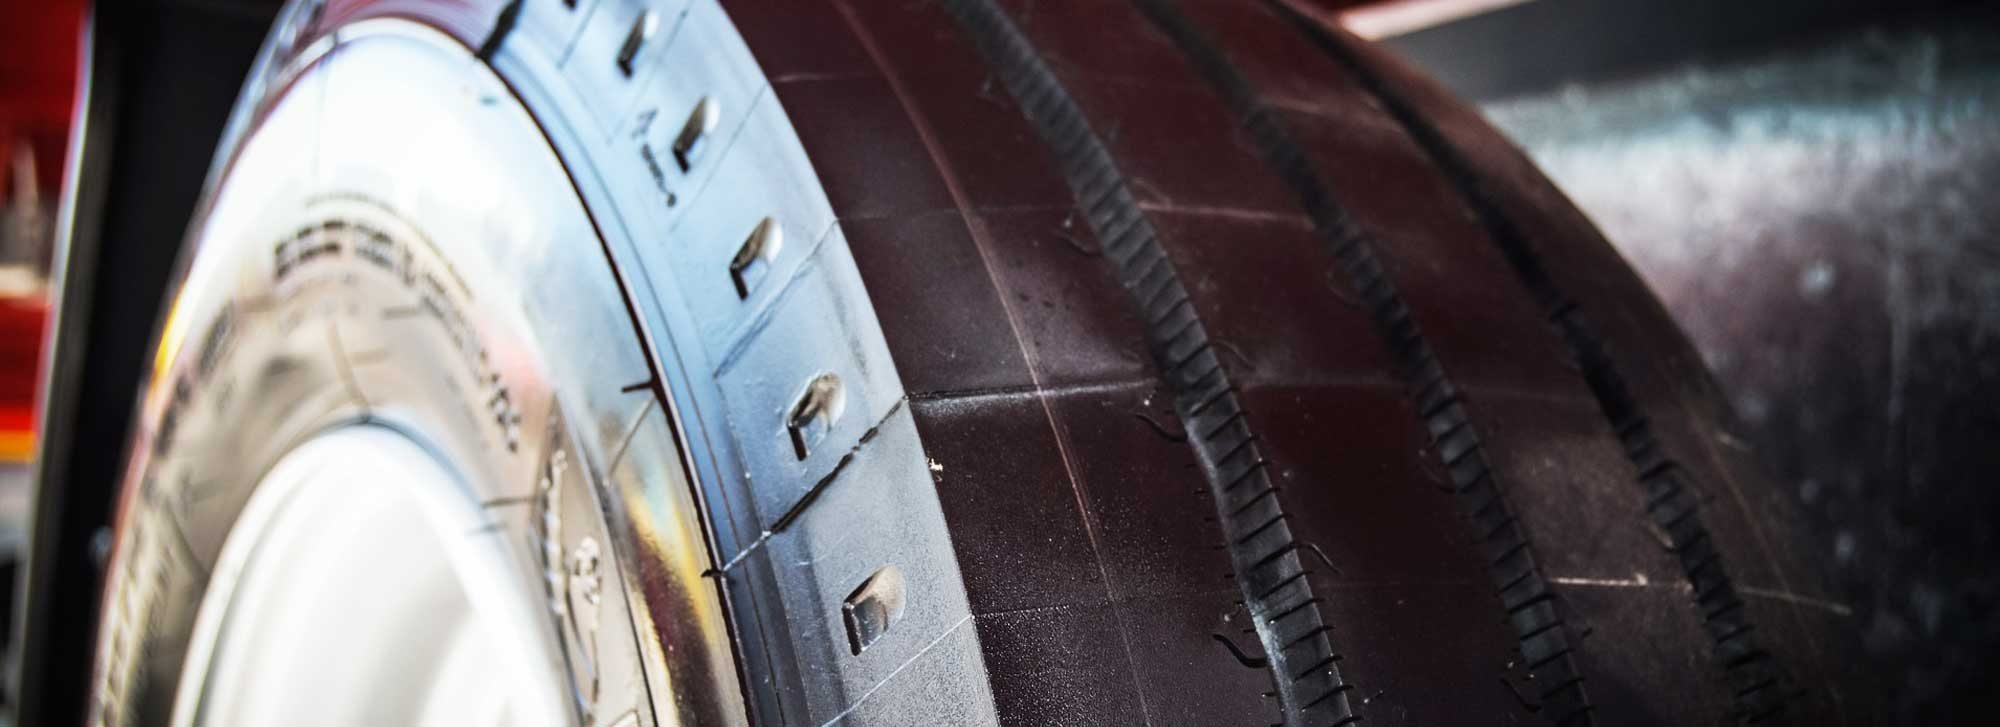 Tyre Repairs, Retreading & Recapping